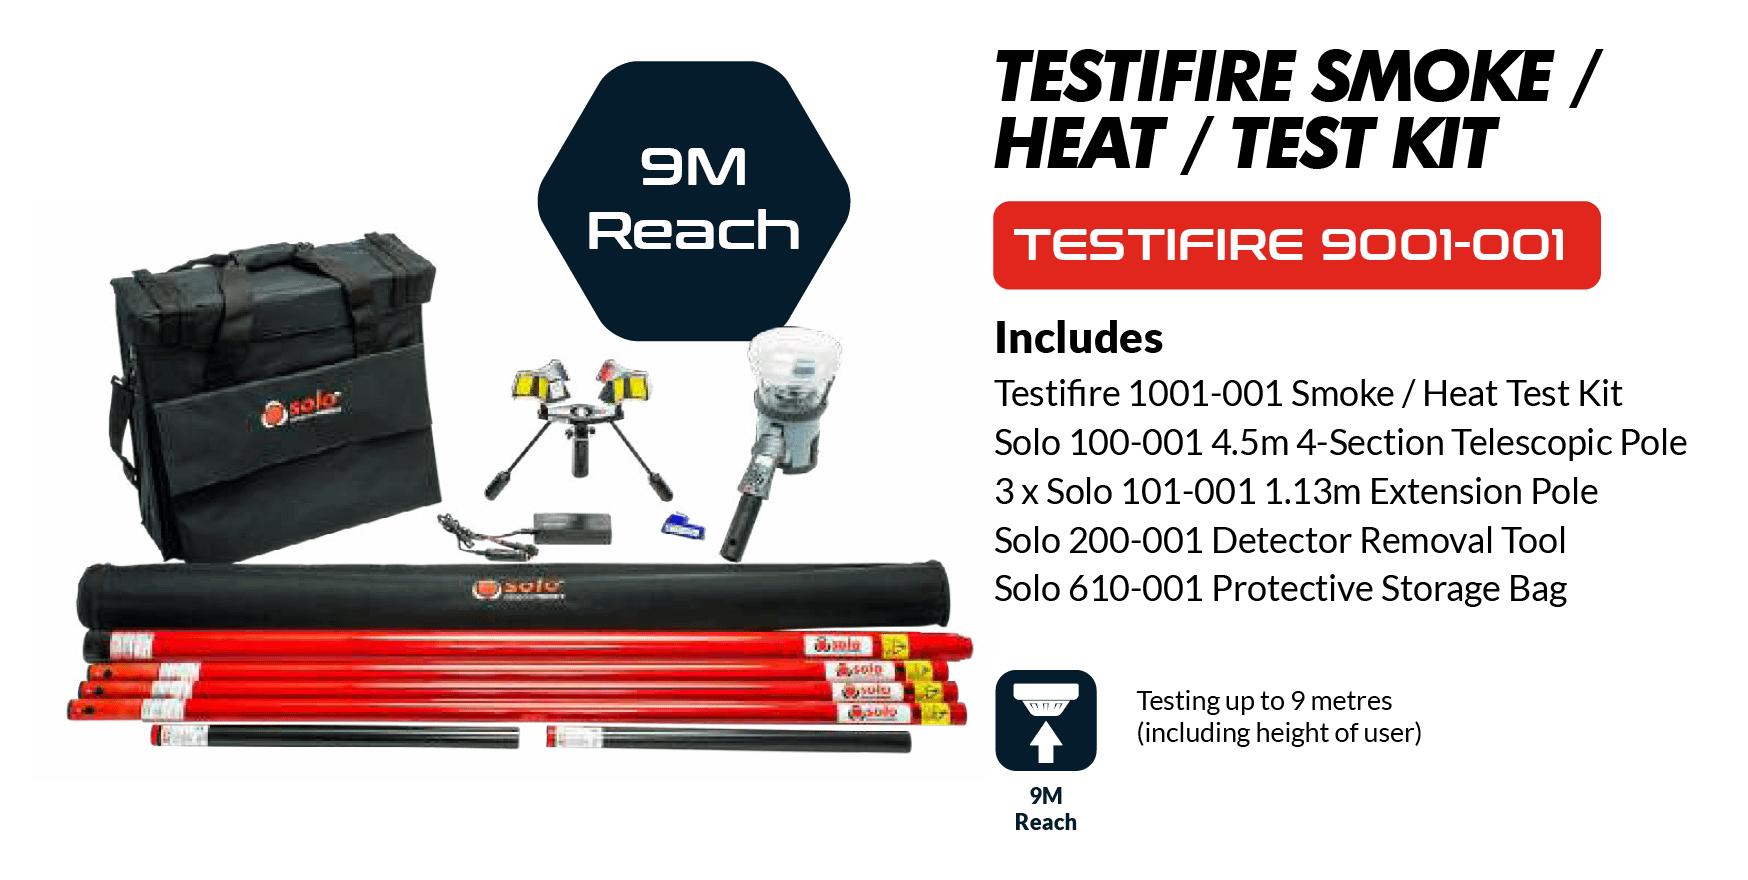 solo-detector-testers-testifire-no-climb-9001-smoke-and-heat-detector-test-kit-singapore